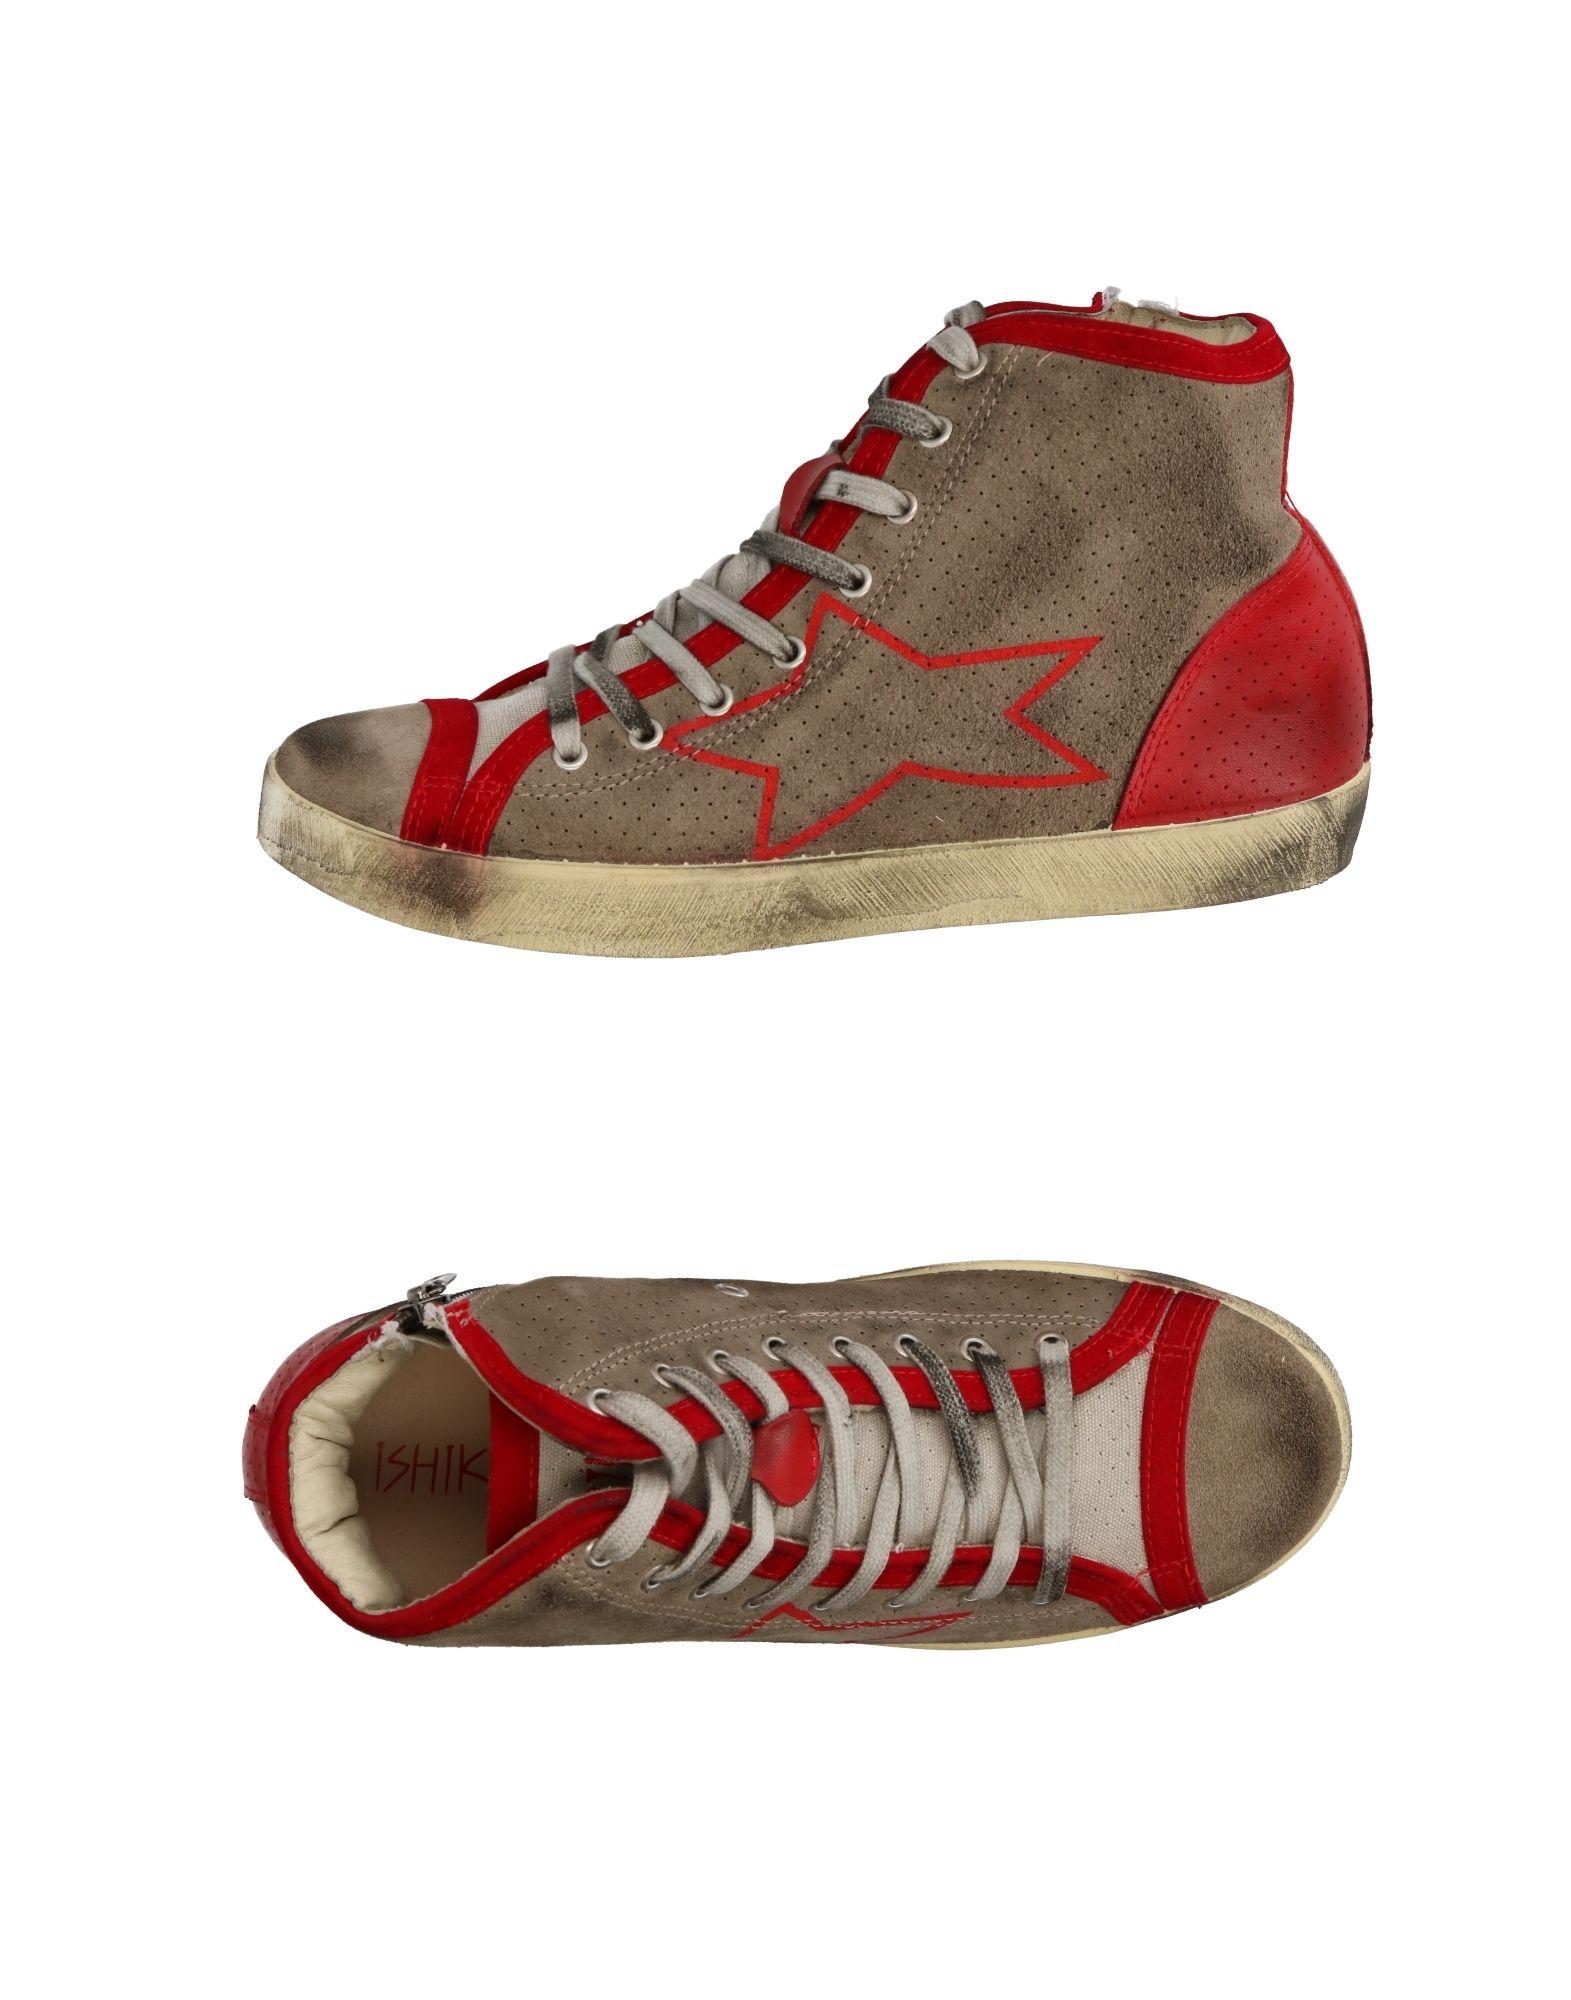 ISHIKAWA Высокие кеды и кроссовки кеды кроссовки высокие dc council mid tx stone camo